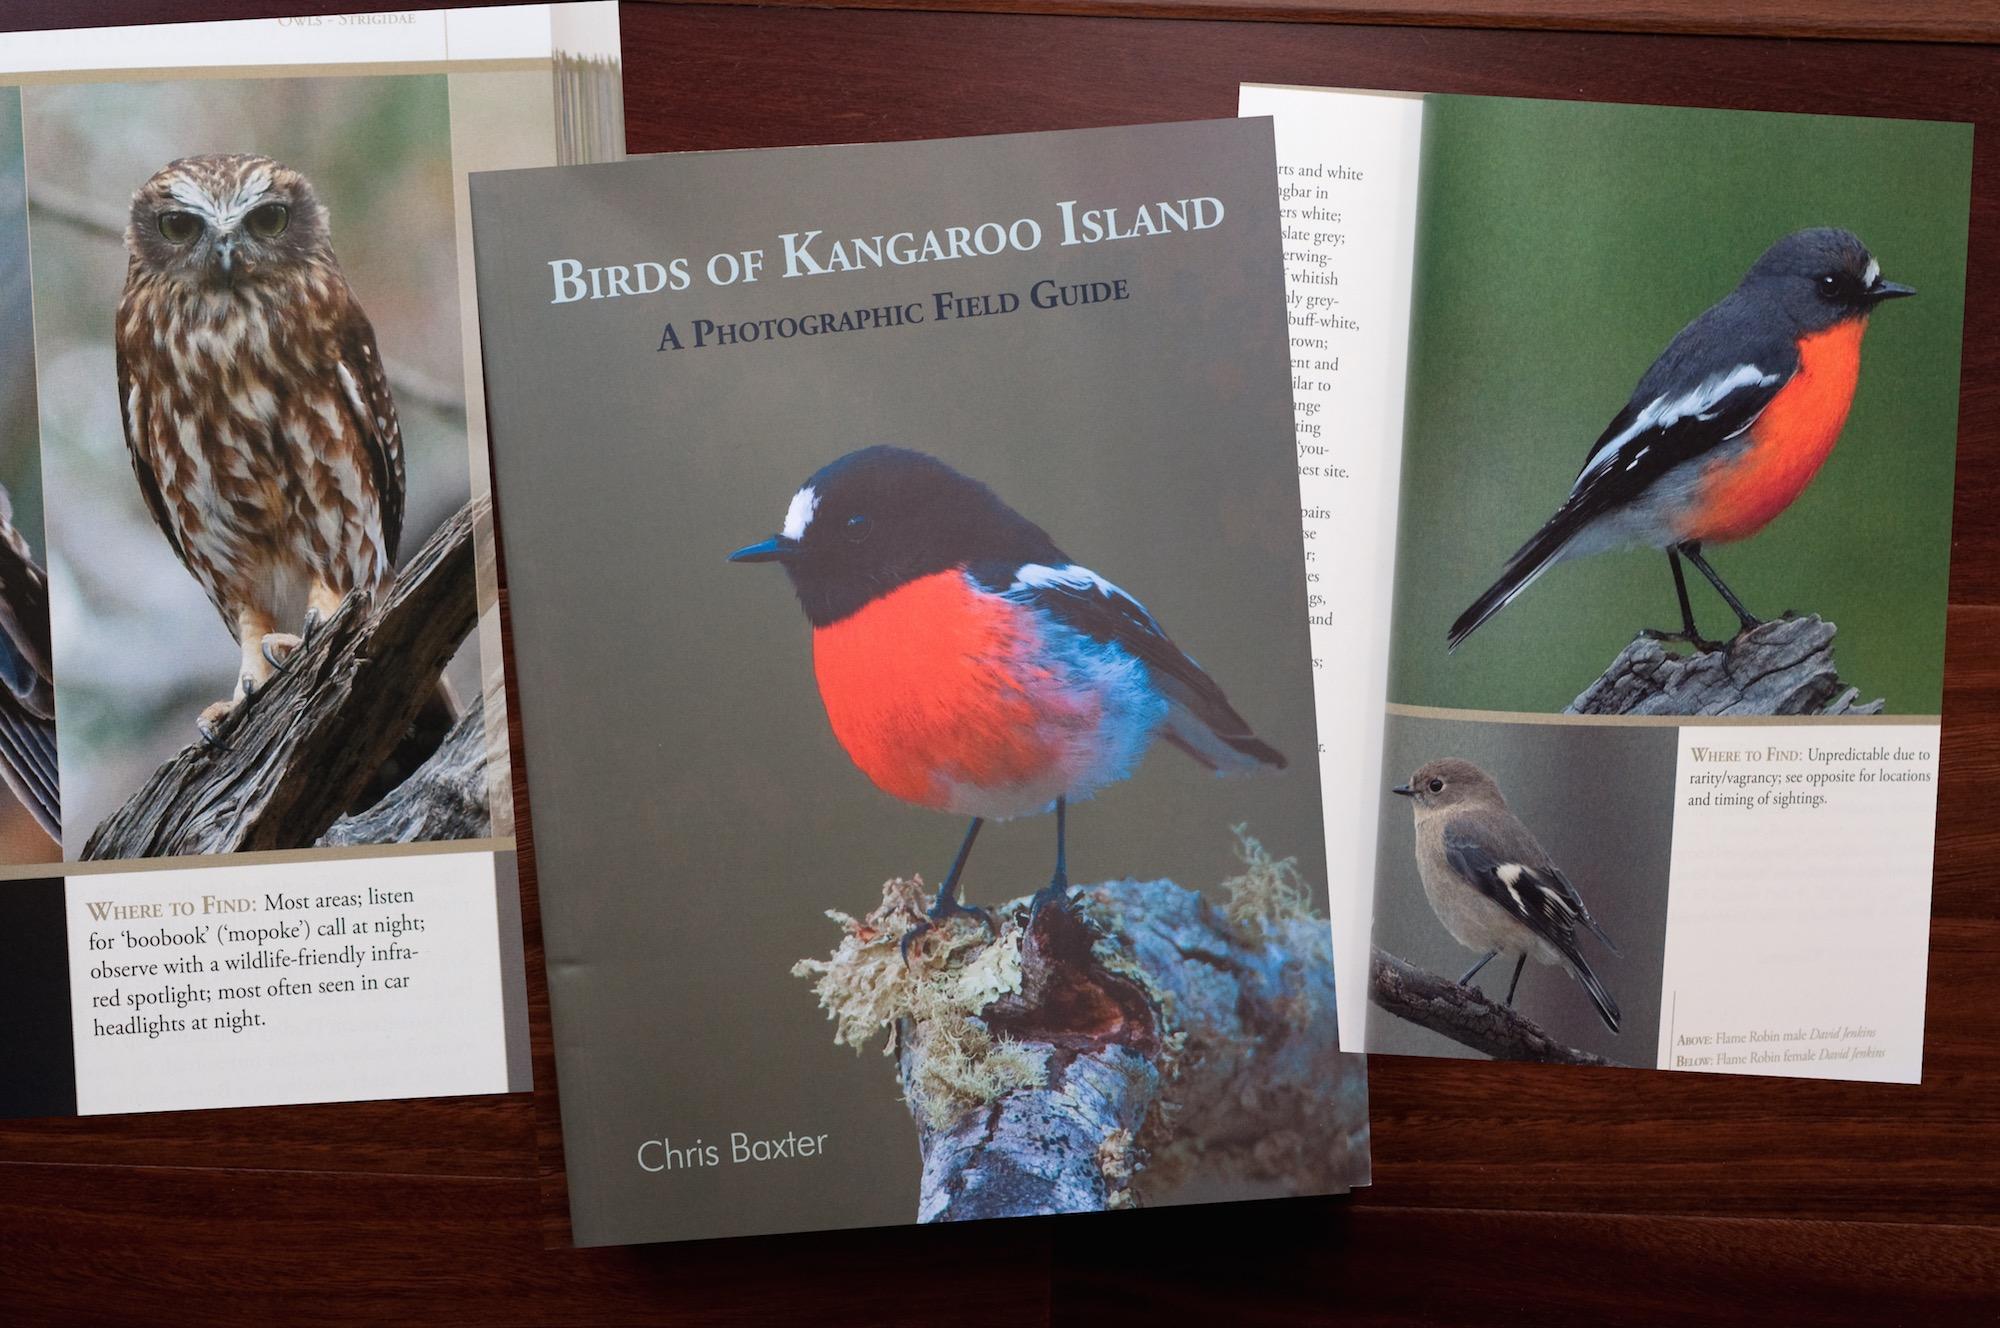 Birds of Kangaroo Island A Photographic Field Guide